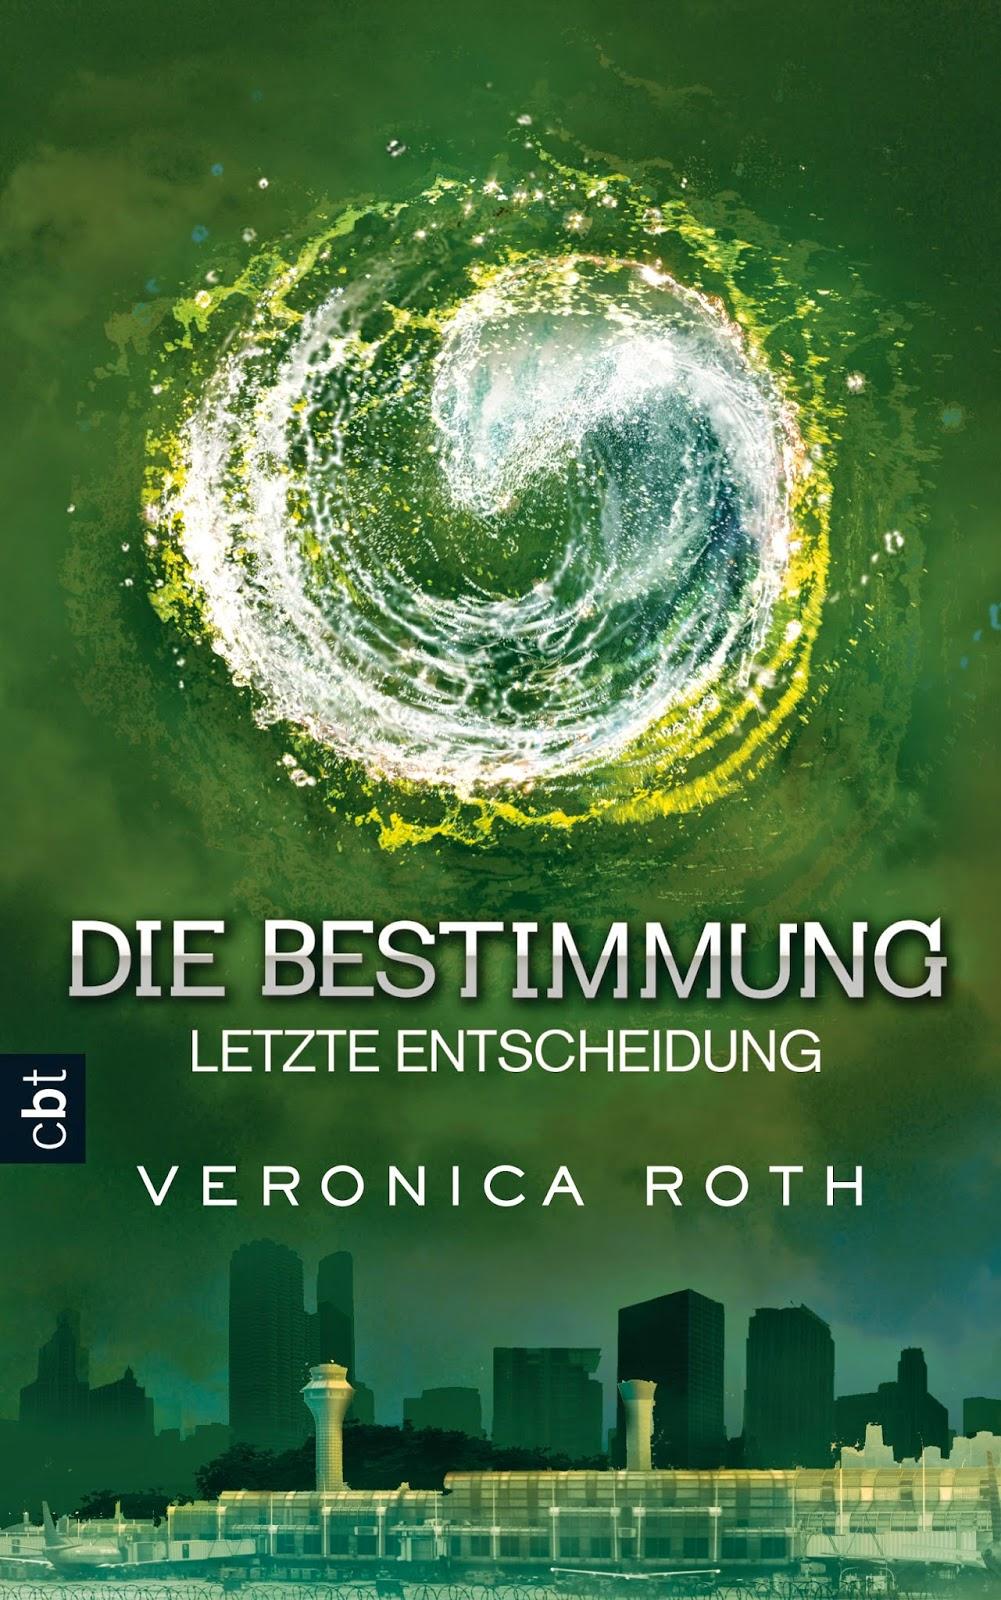 http://www.randomhouse.de/content/edition/covervoila_hires/Roth_VDie_Bestimmung_03_-_Entscheidung_143122.jpg